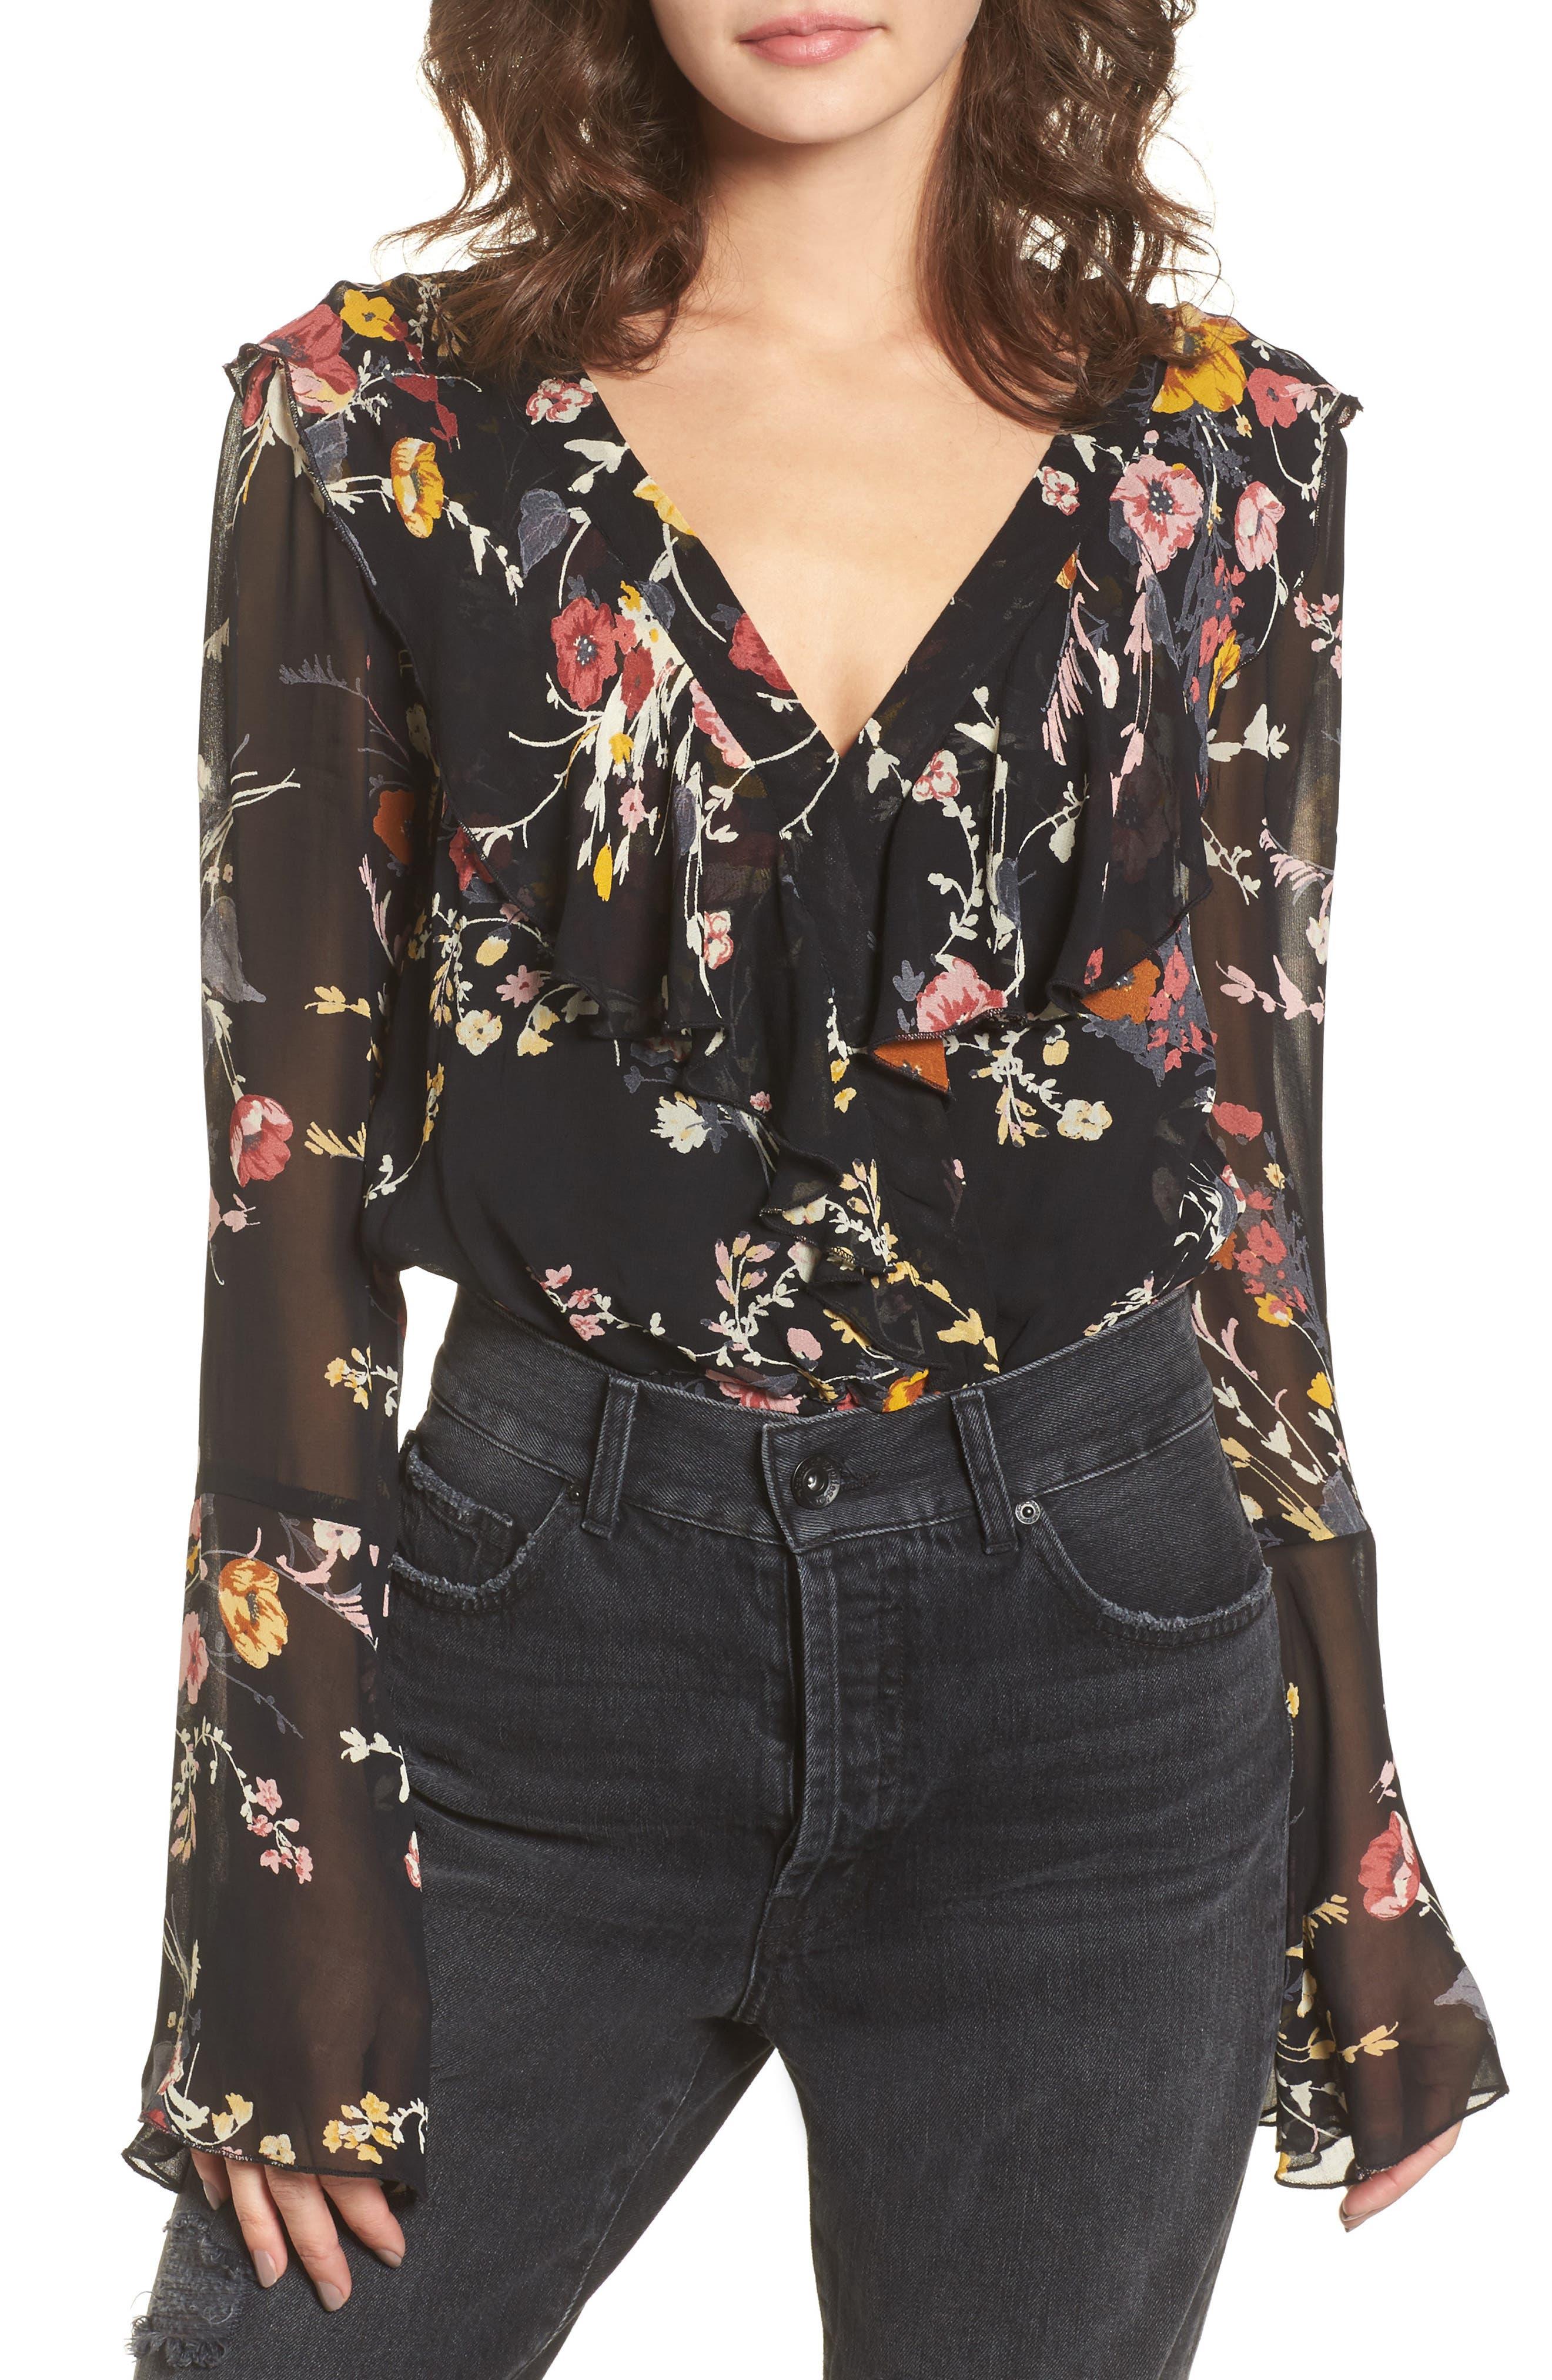 Floral Ruffle Bodysuit,                             Main thumbnail 1, color,                             Black/ Mustard